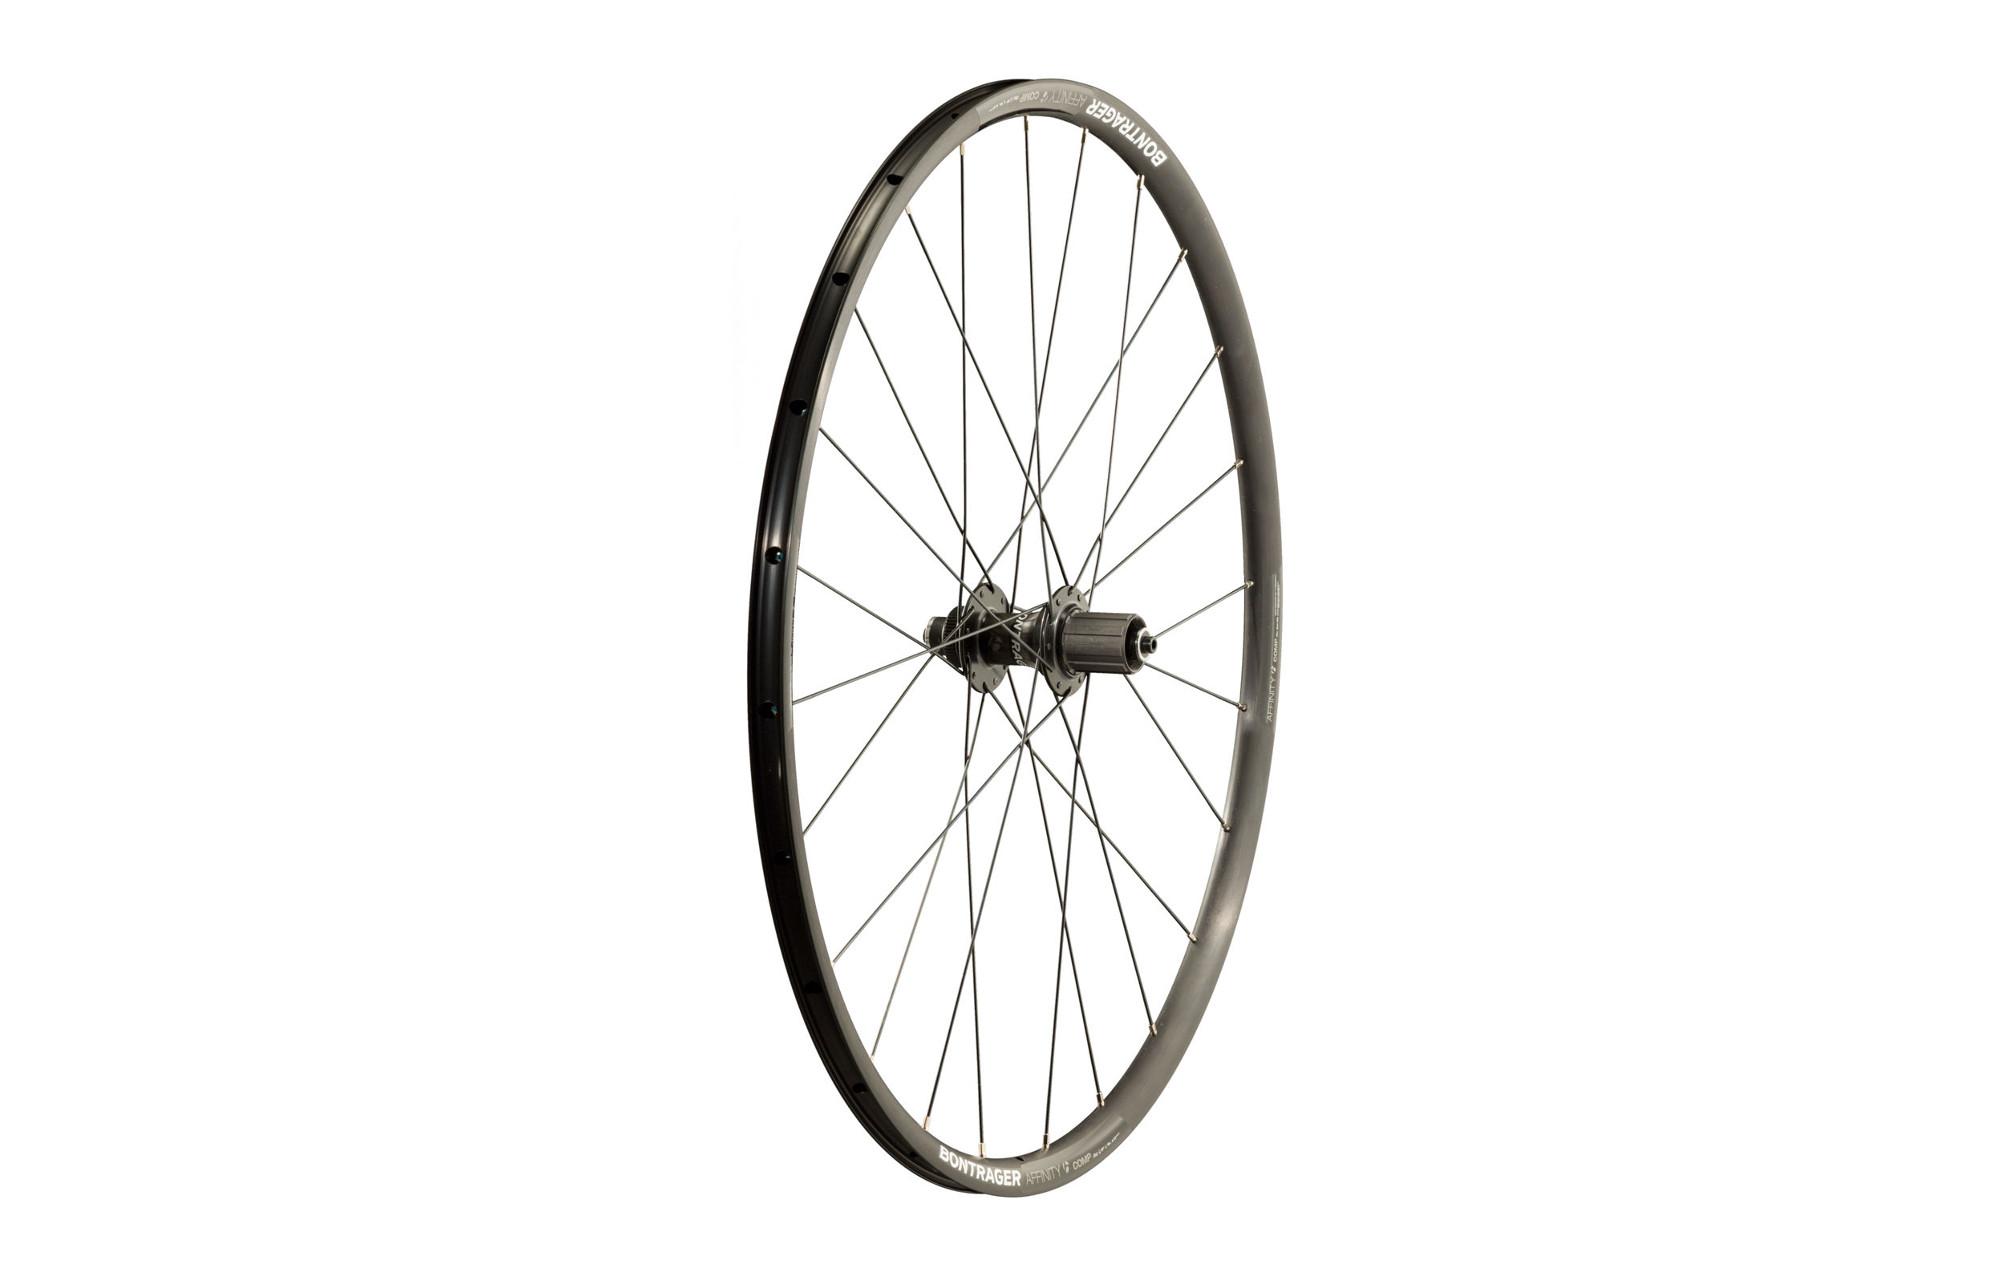 bontrager roue arri re route affinity comp 700c tlr disque. Black Bedroom Furniture Sets. Home Design Ideas